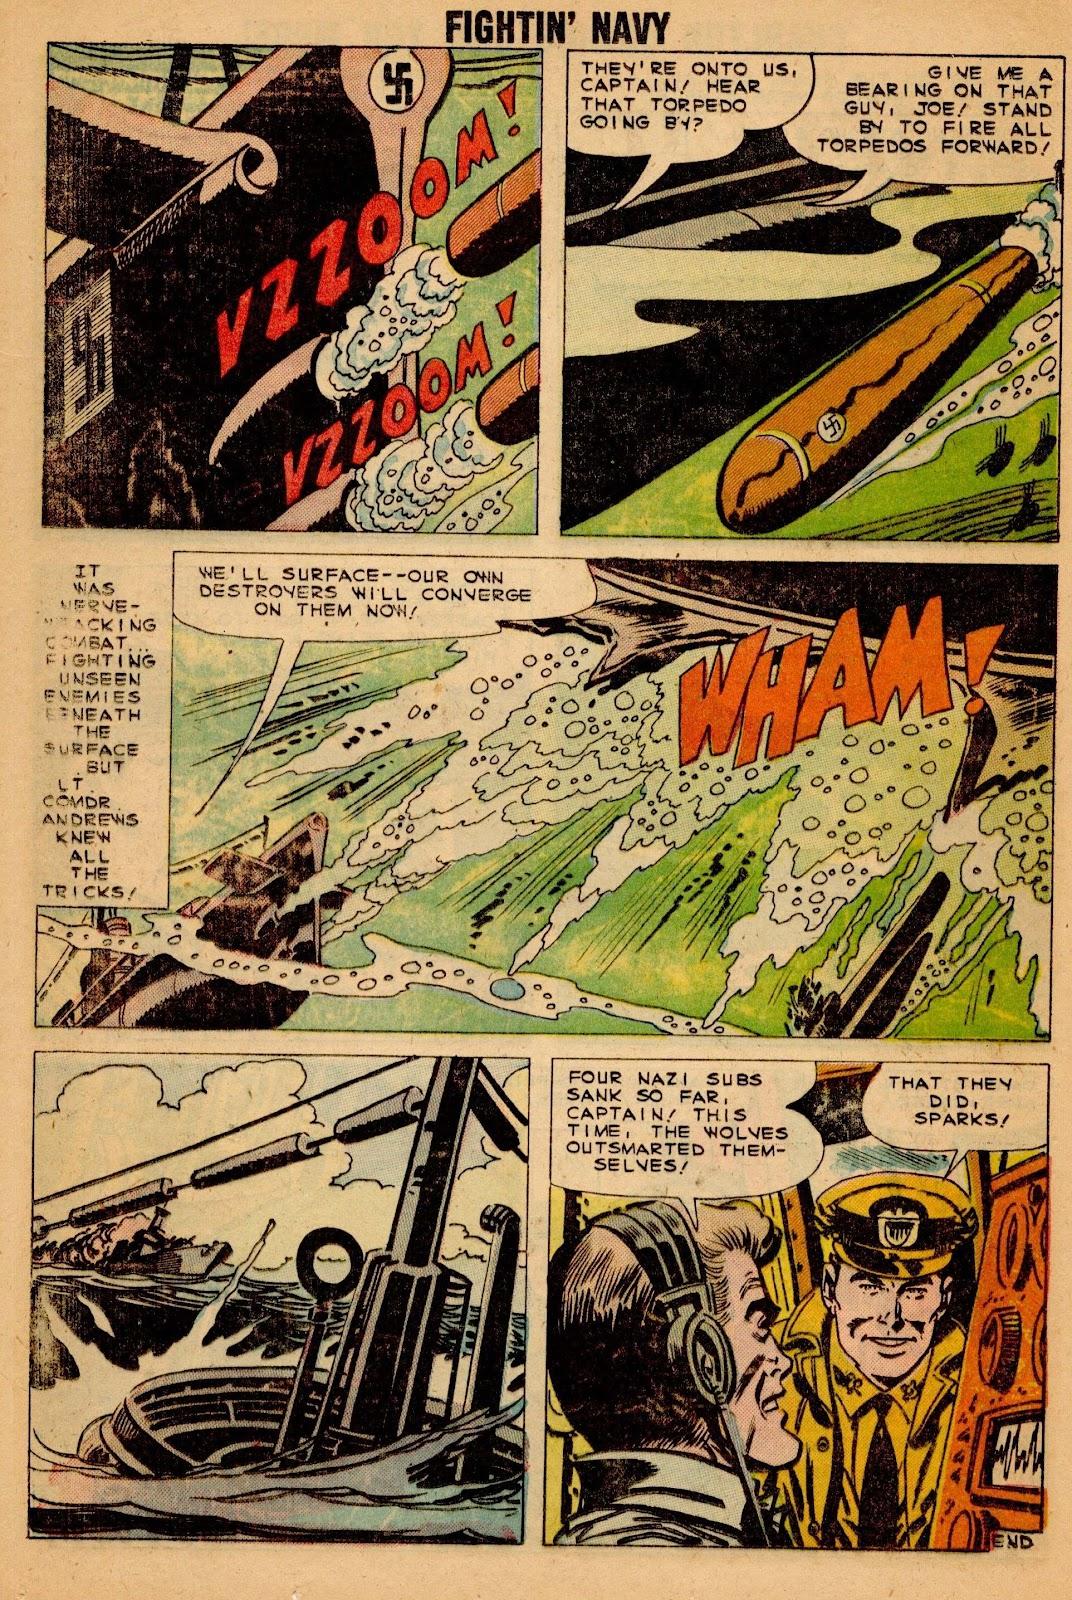 Read online Fightin' Navy comic -  Issue #90 - 24